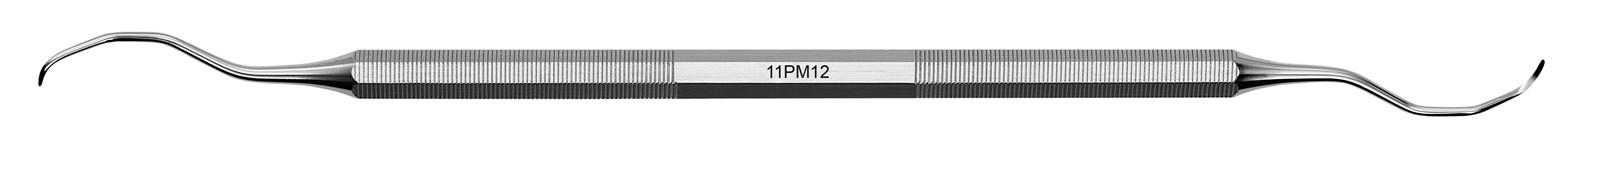 Kyreta Gracey Mini - 11PM12, ADEP tmavě zelený